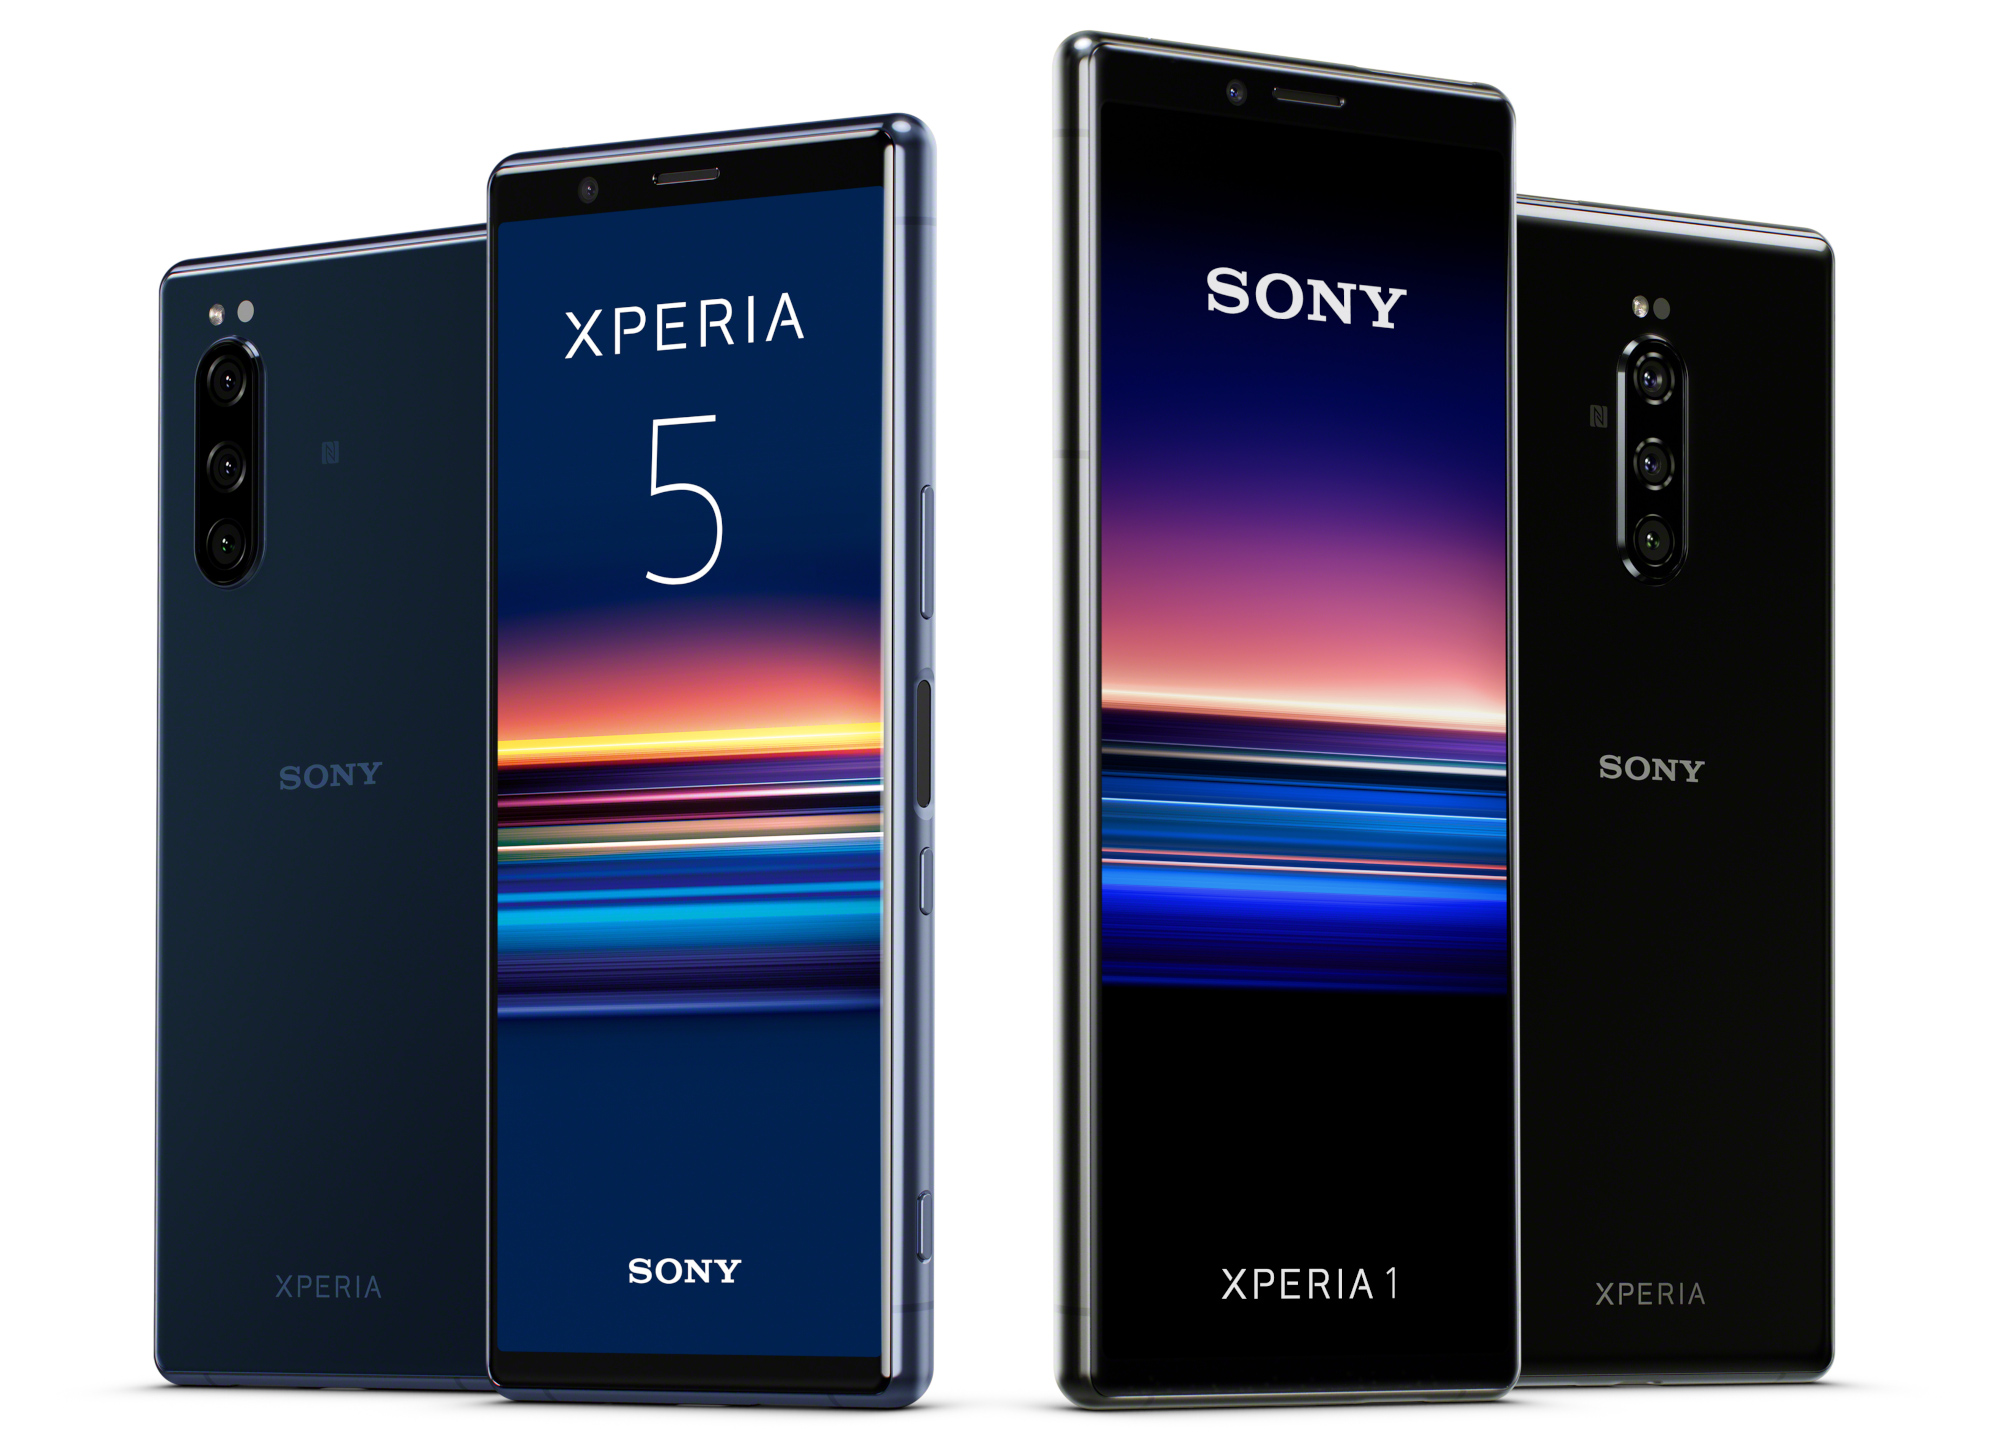 Sony Xperia 5 und Sony Xperia 1 im Vergleich